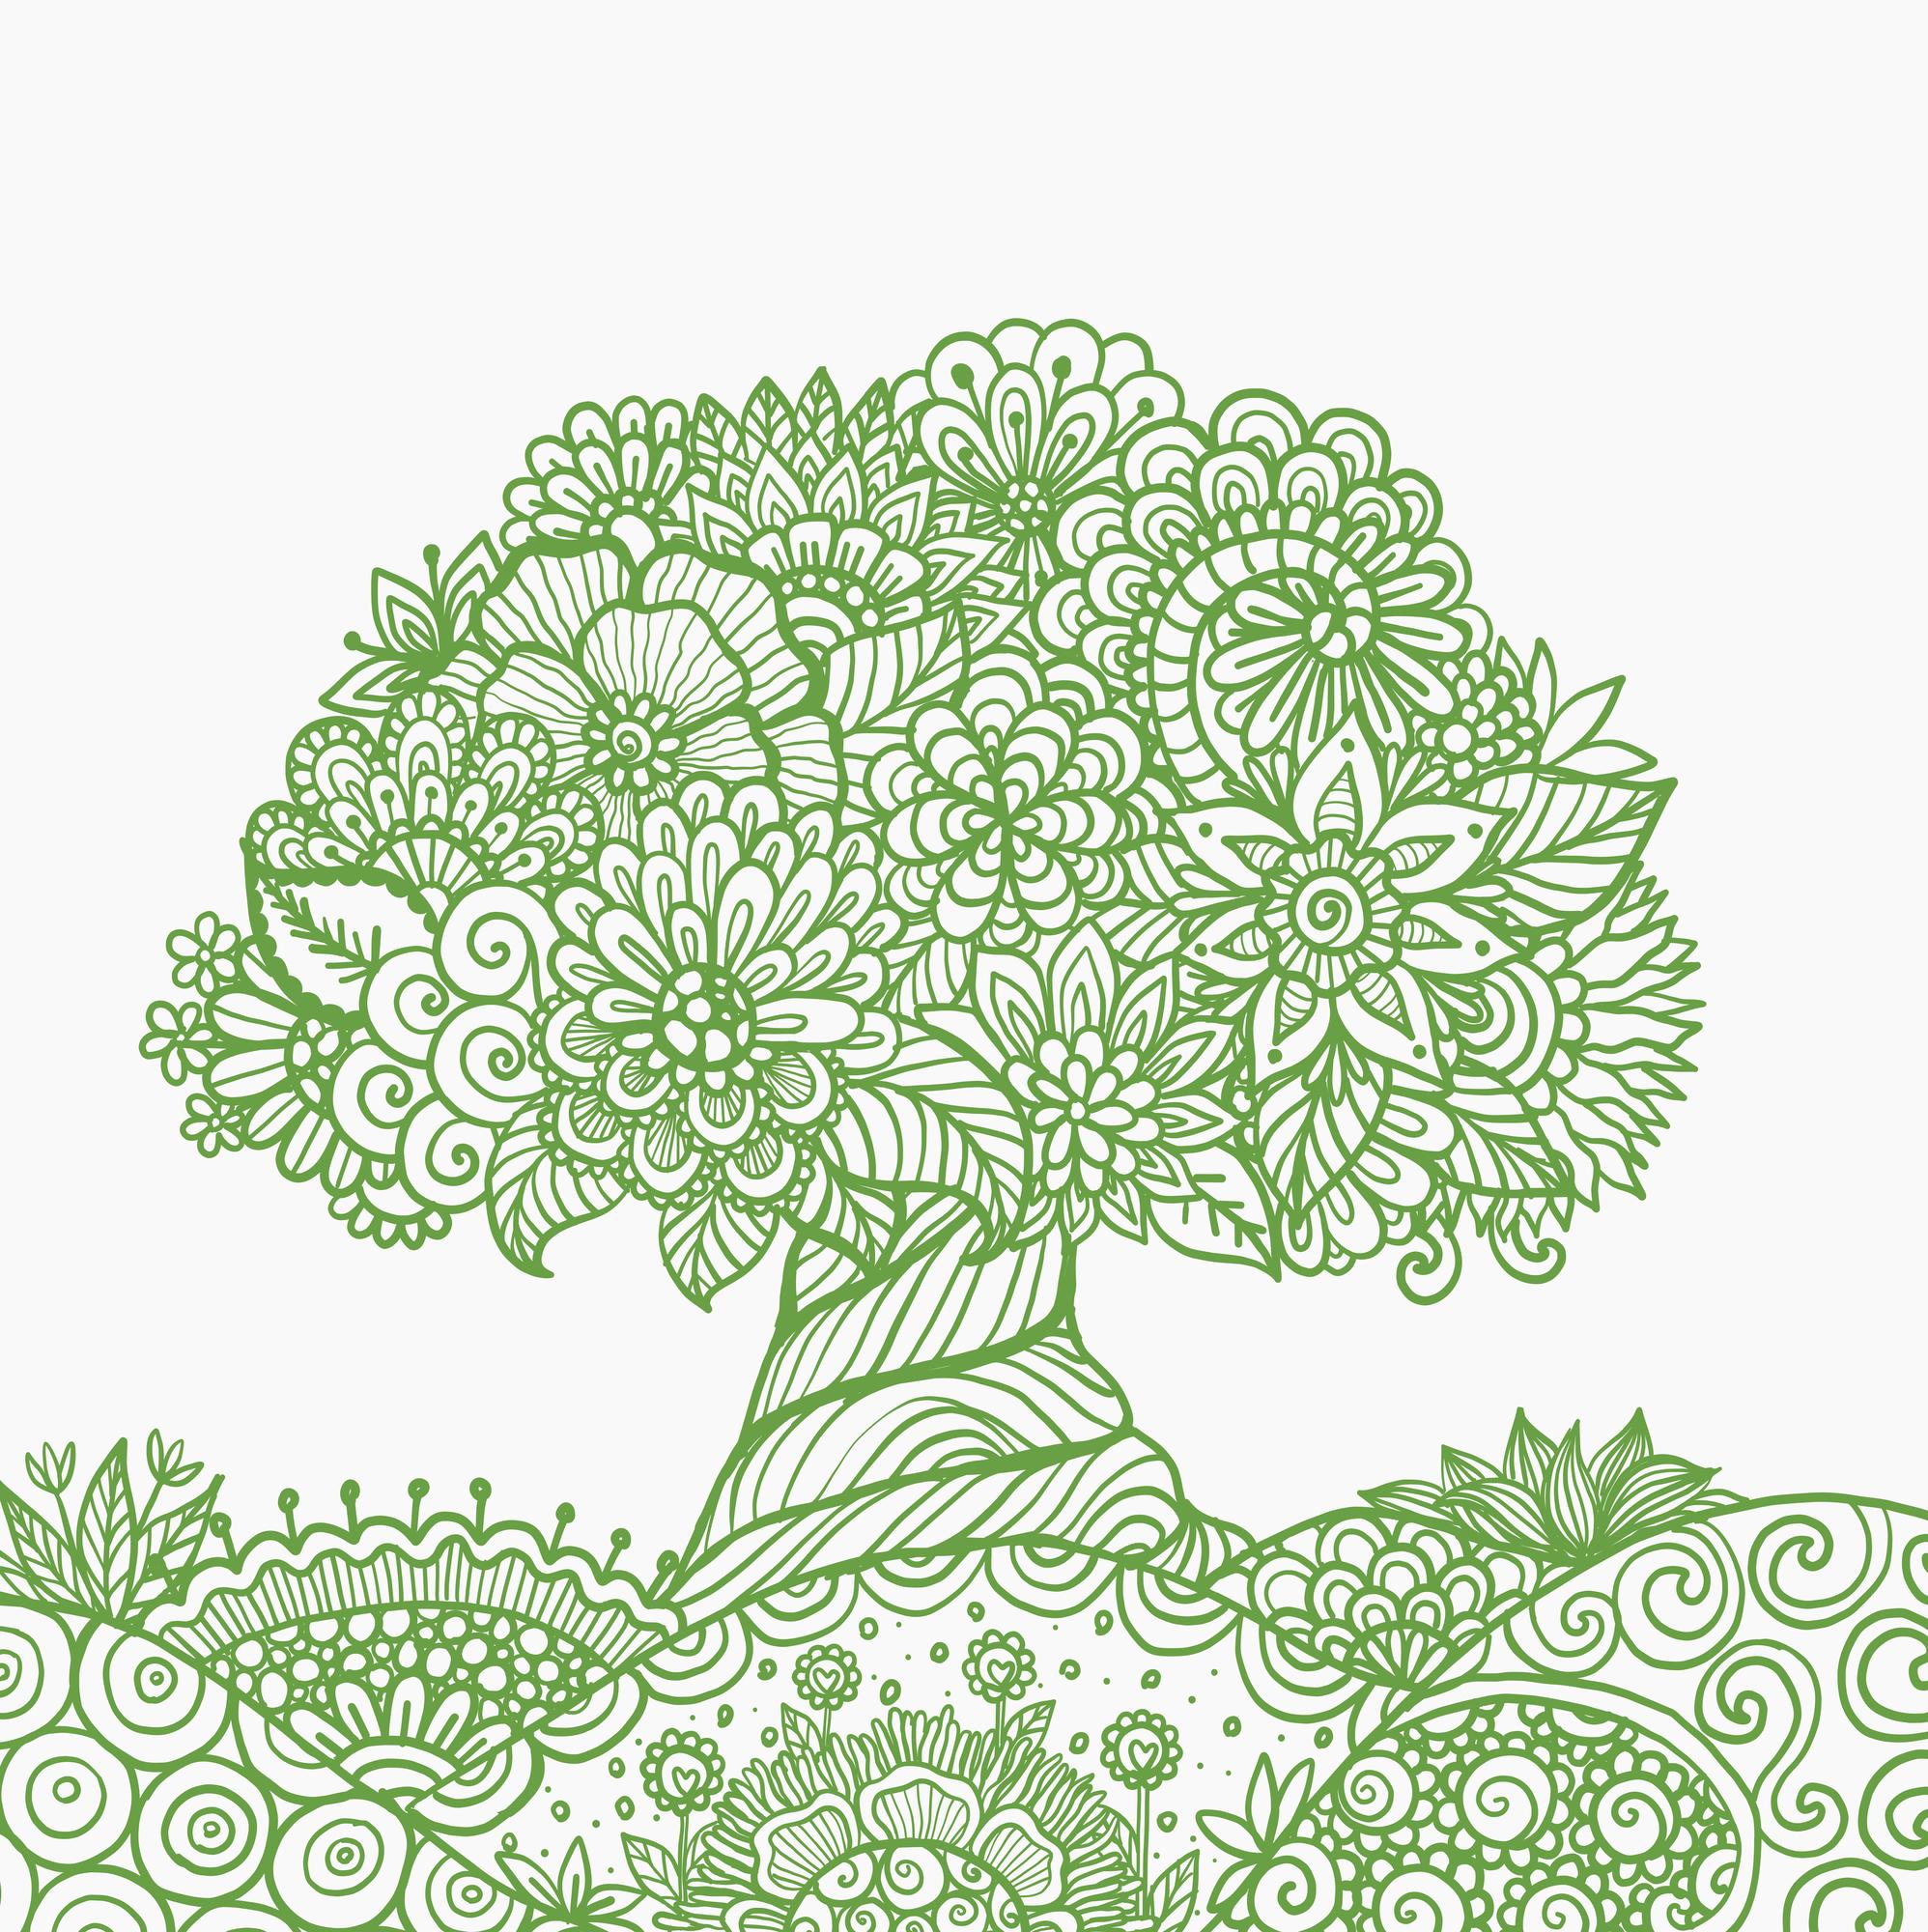 Thrive Arts Earth Day Tree Art.jpg